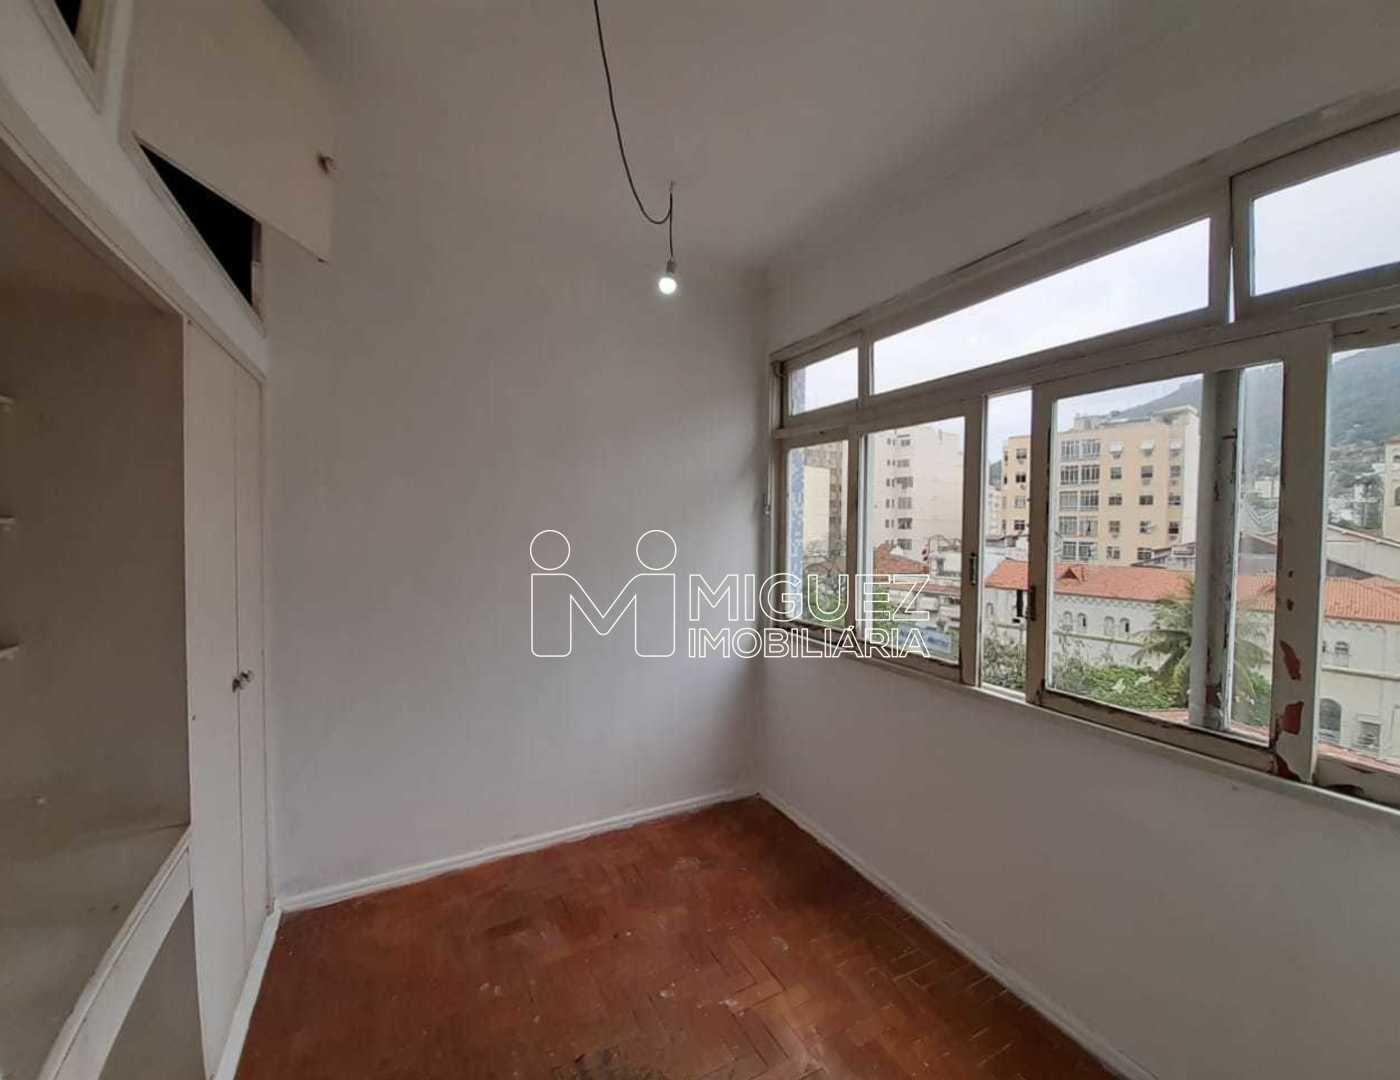 Apartamento, venda, Rua Antônio Basílio - Tijuca , Rio de janeiro